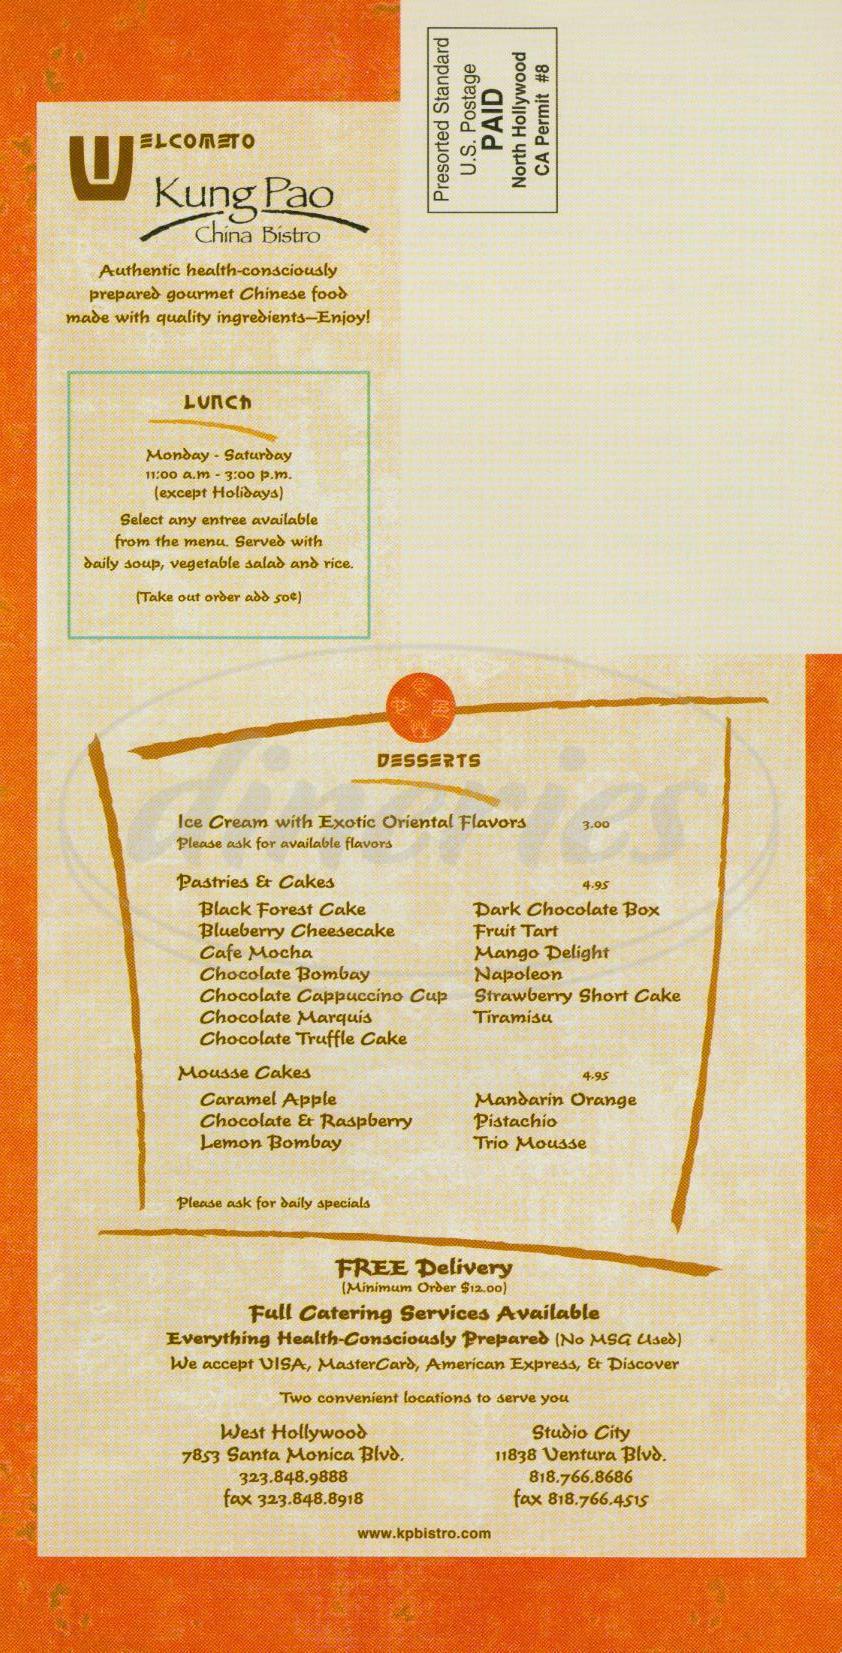 menu for Kung Pao China Bistro